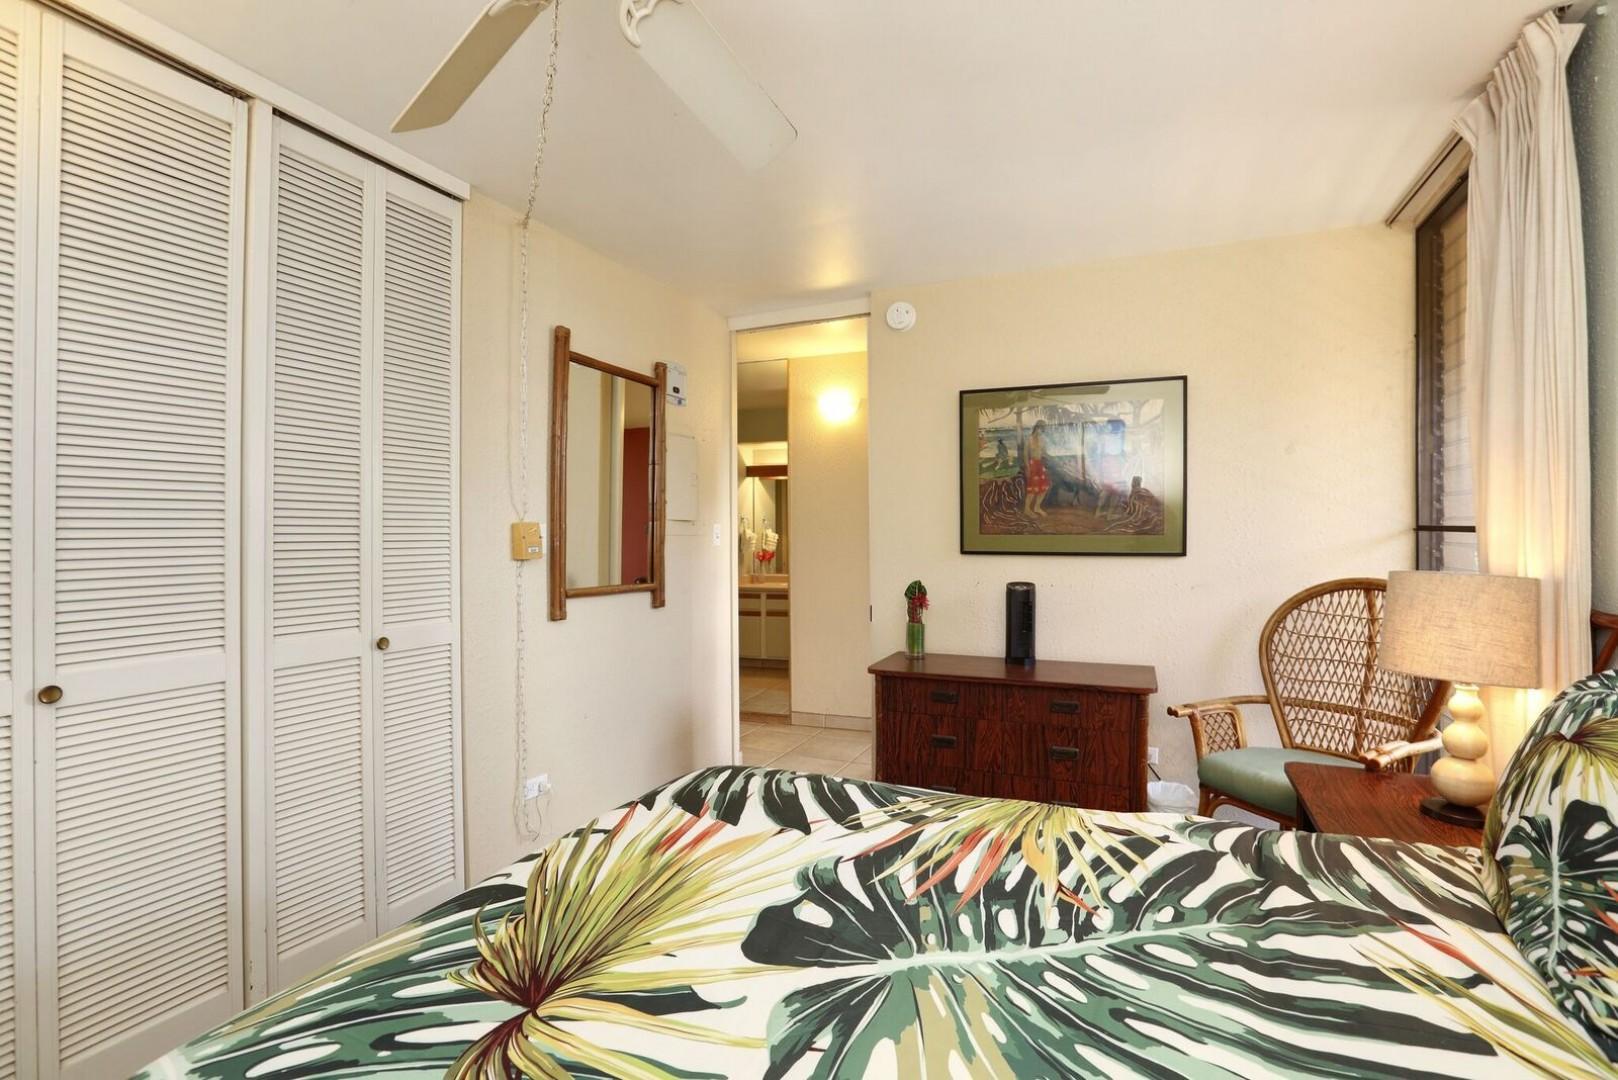 One bedroom unit with plenty of closet space